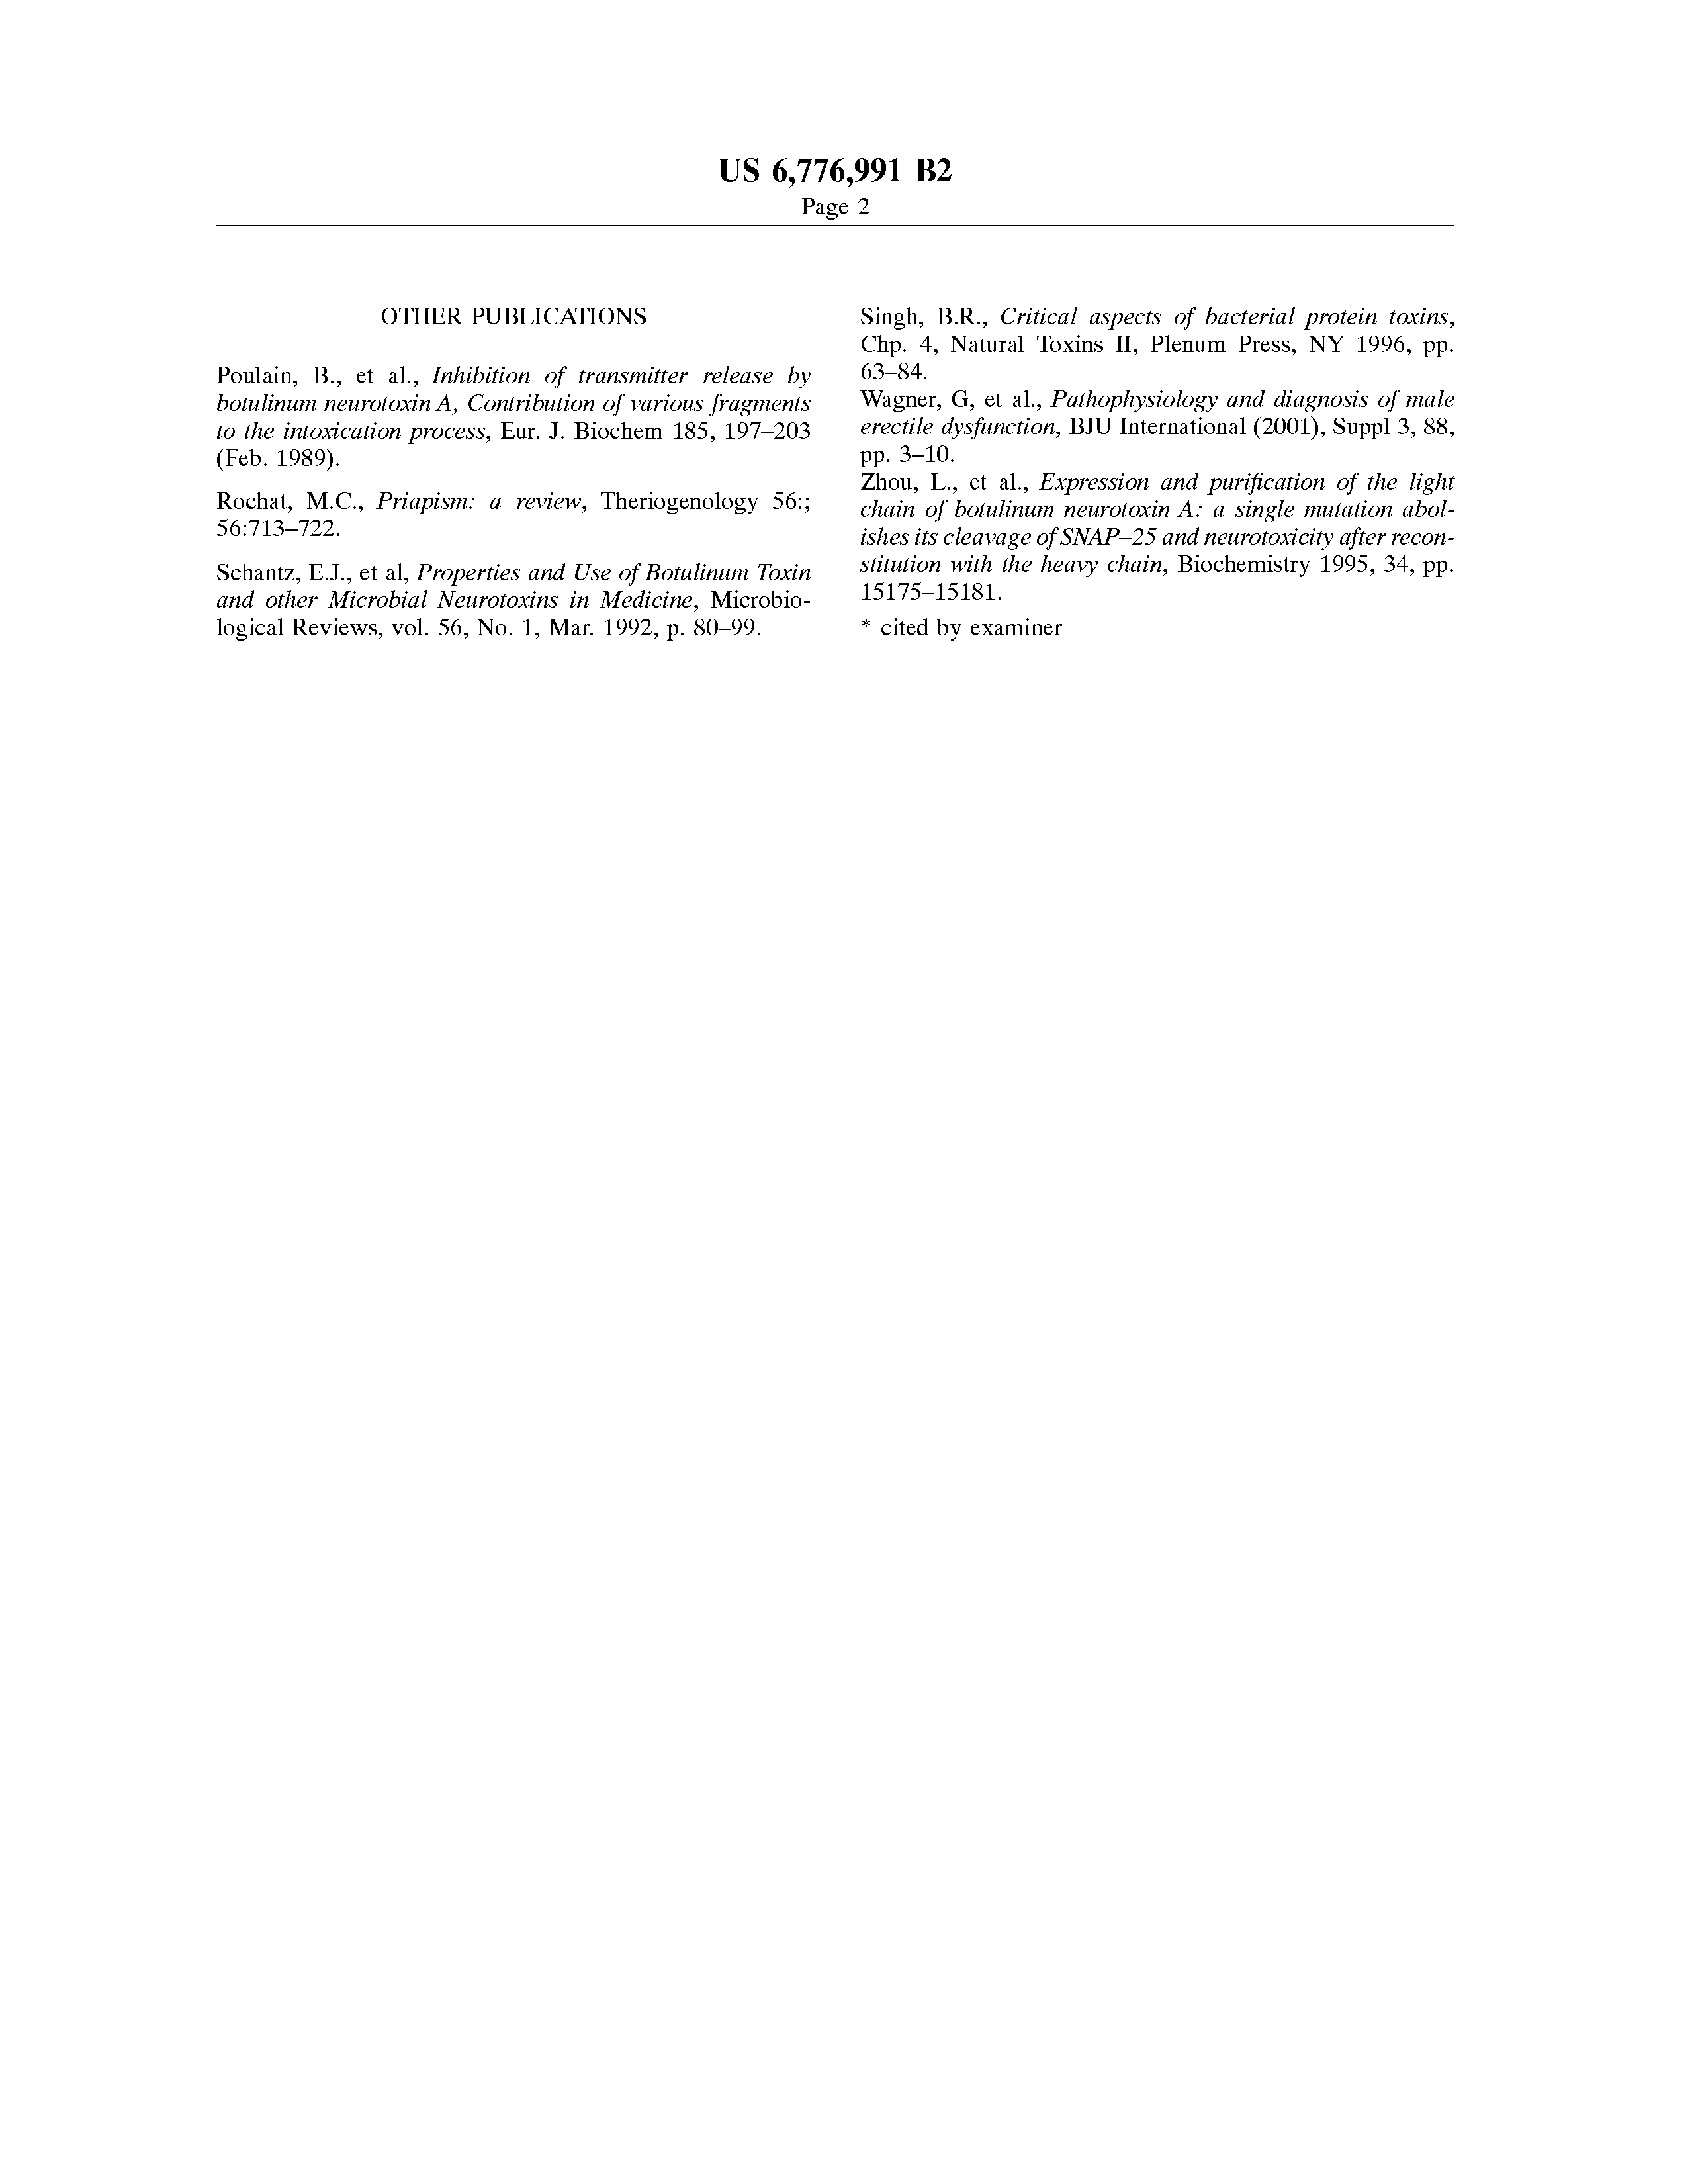 patentimages storage googleapis com/pages/US677699